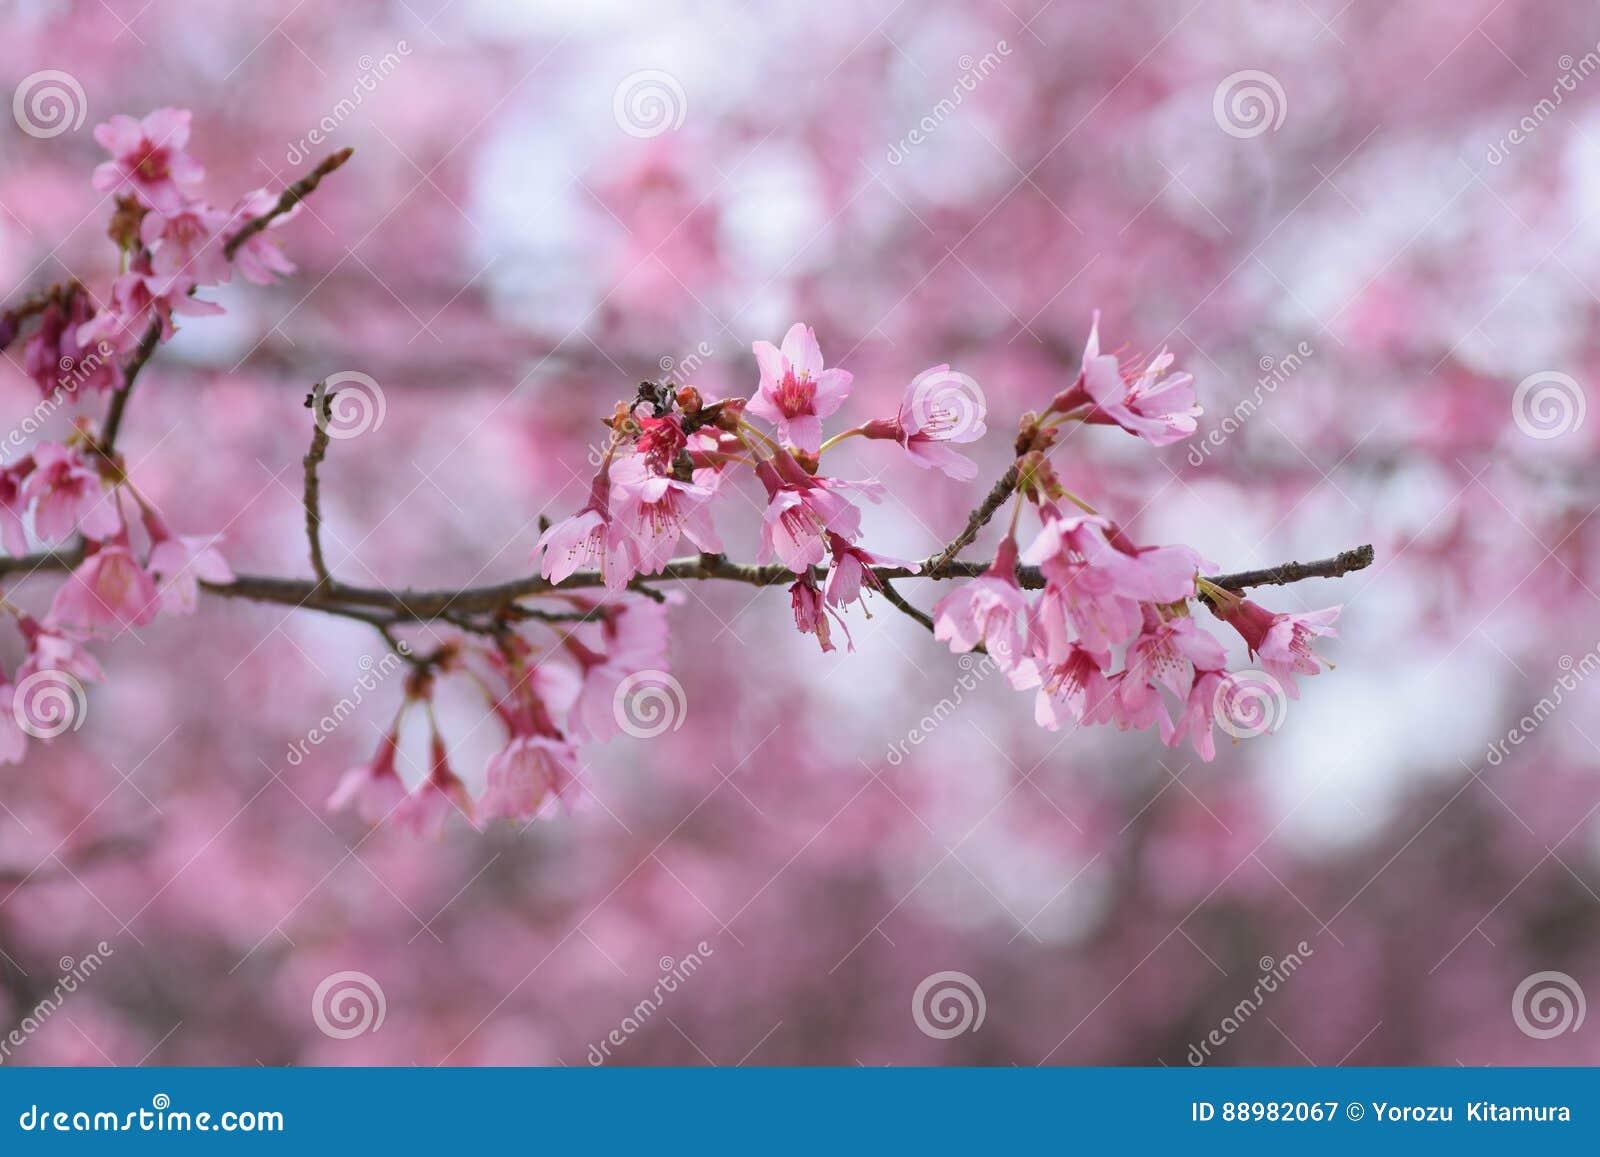 Kers bloosoms in volledige bloei/Maart-landschap in Japan